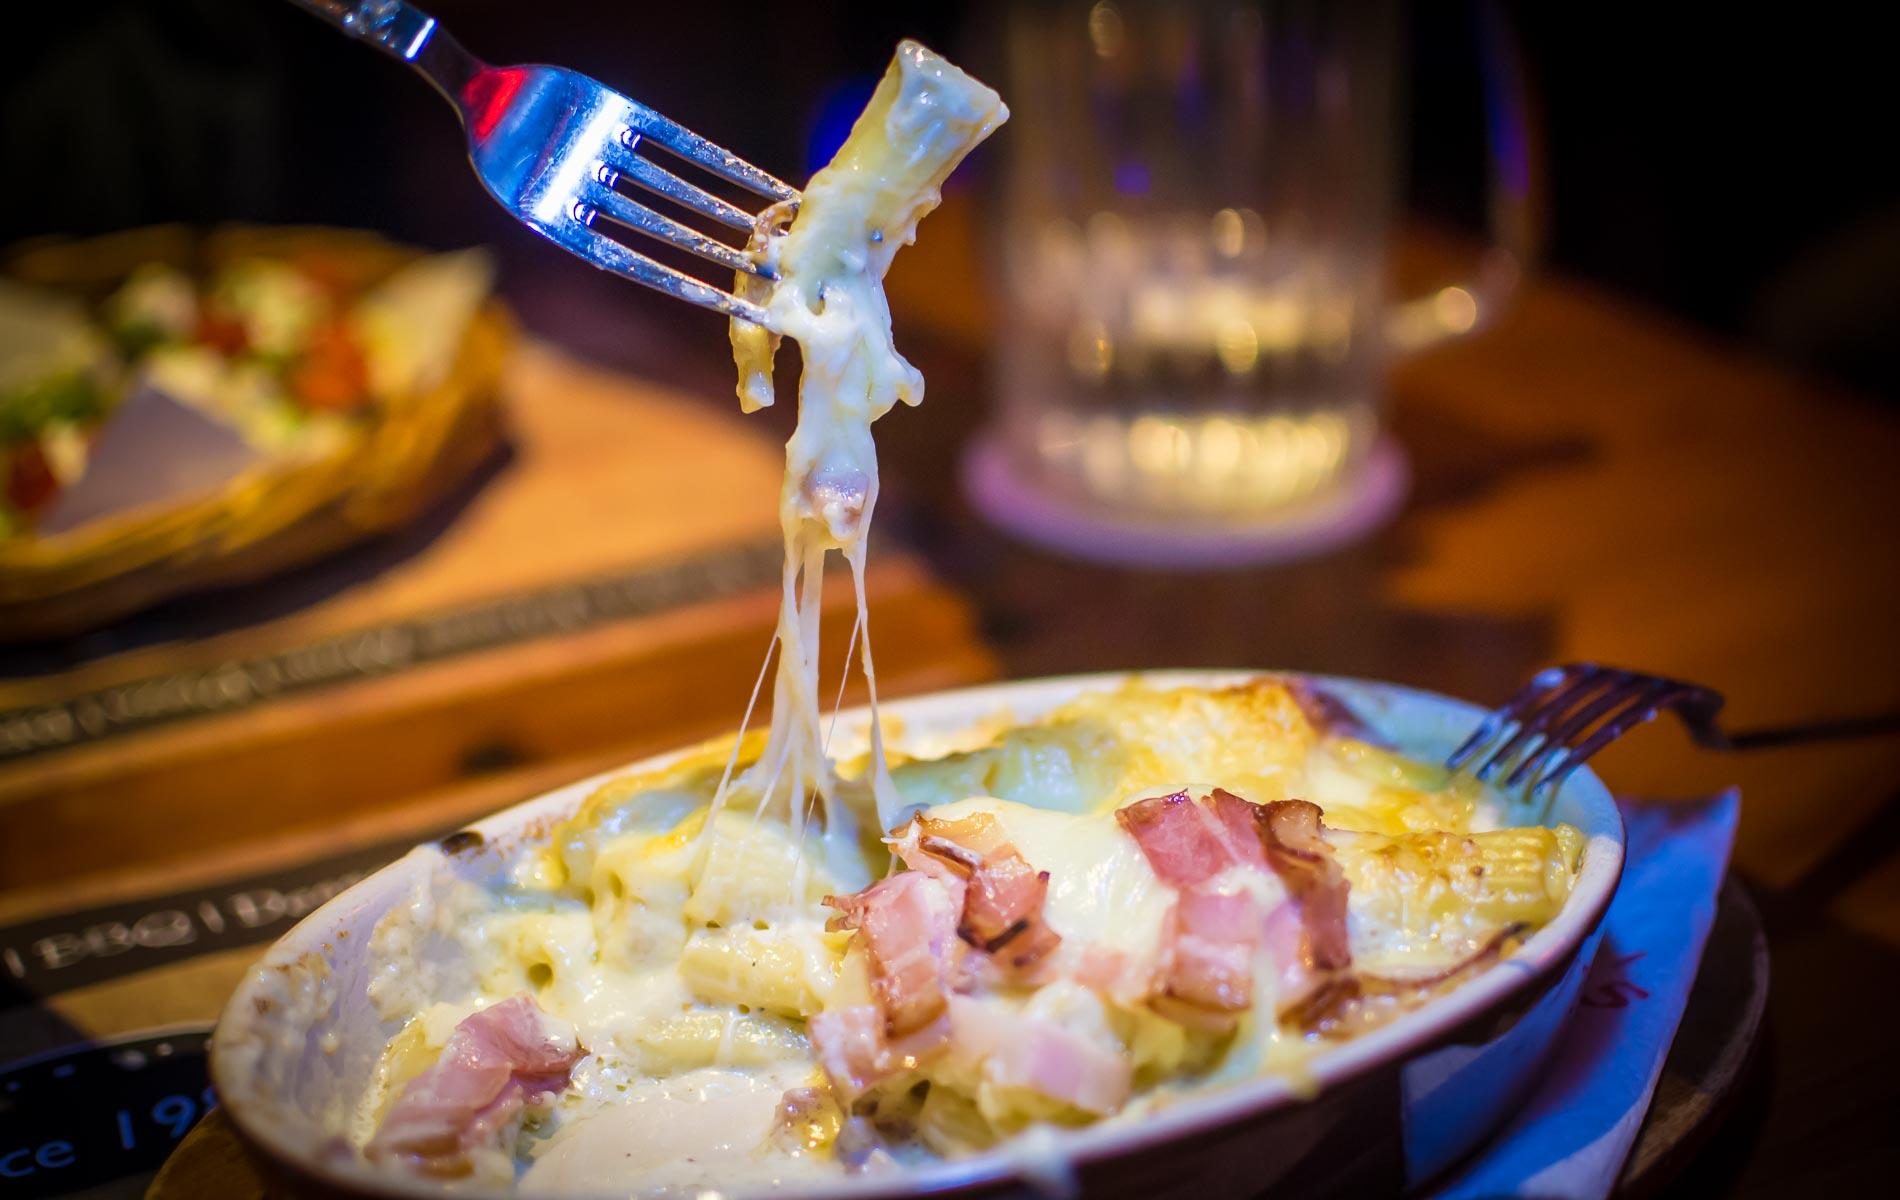 #riggatoni, #pasta, #willyspasta, #cheese, #foodporn, #delicious, #bacon, #willysplace, #willysplacetobe